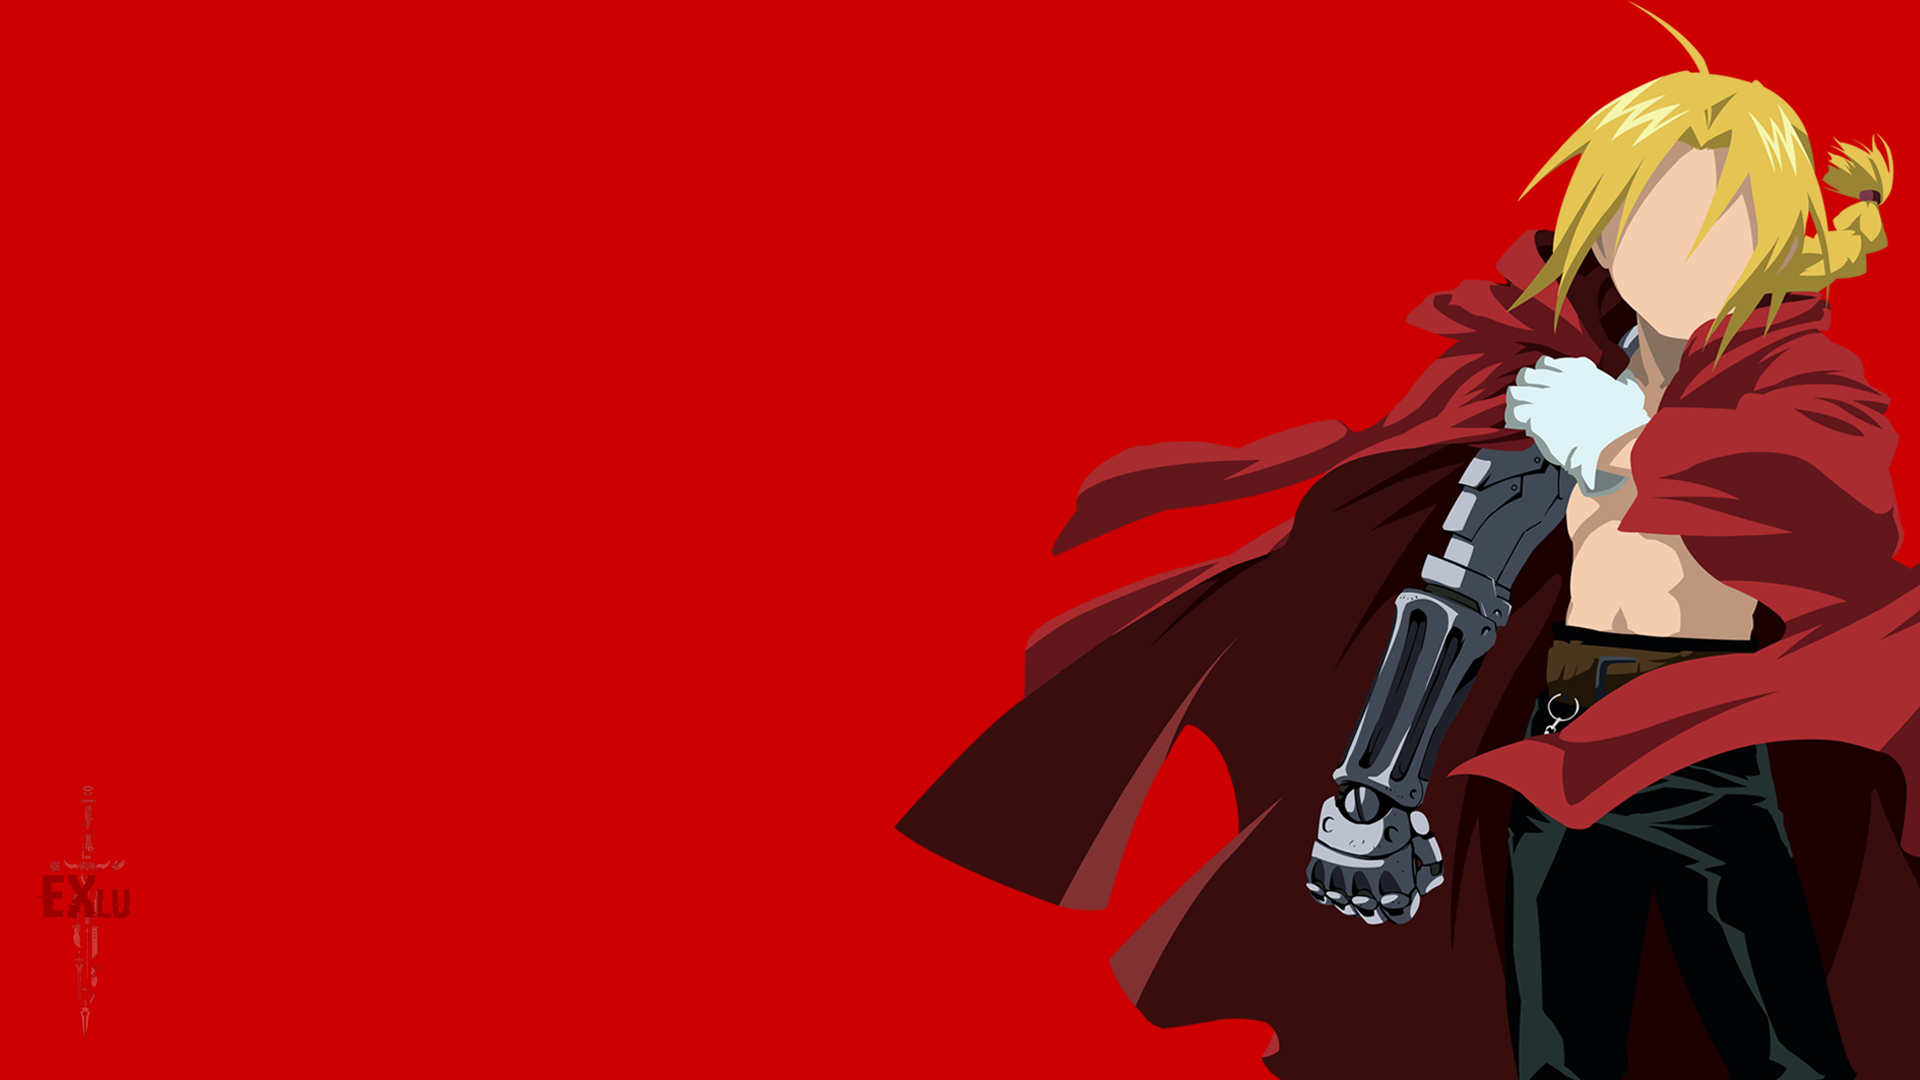 Edward Elric (Fullmetal Alchemist) minimalist by ExLu on DeviantArt